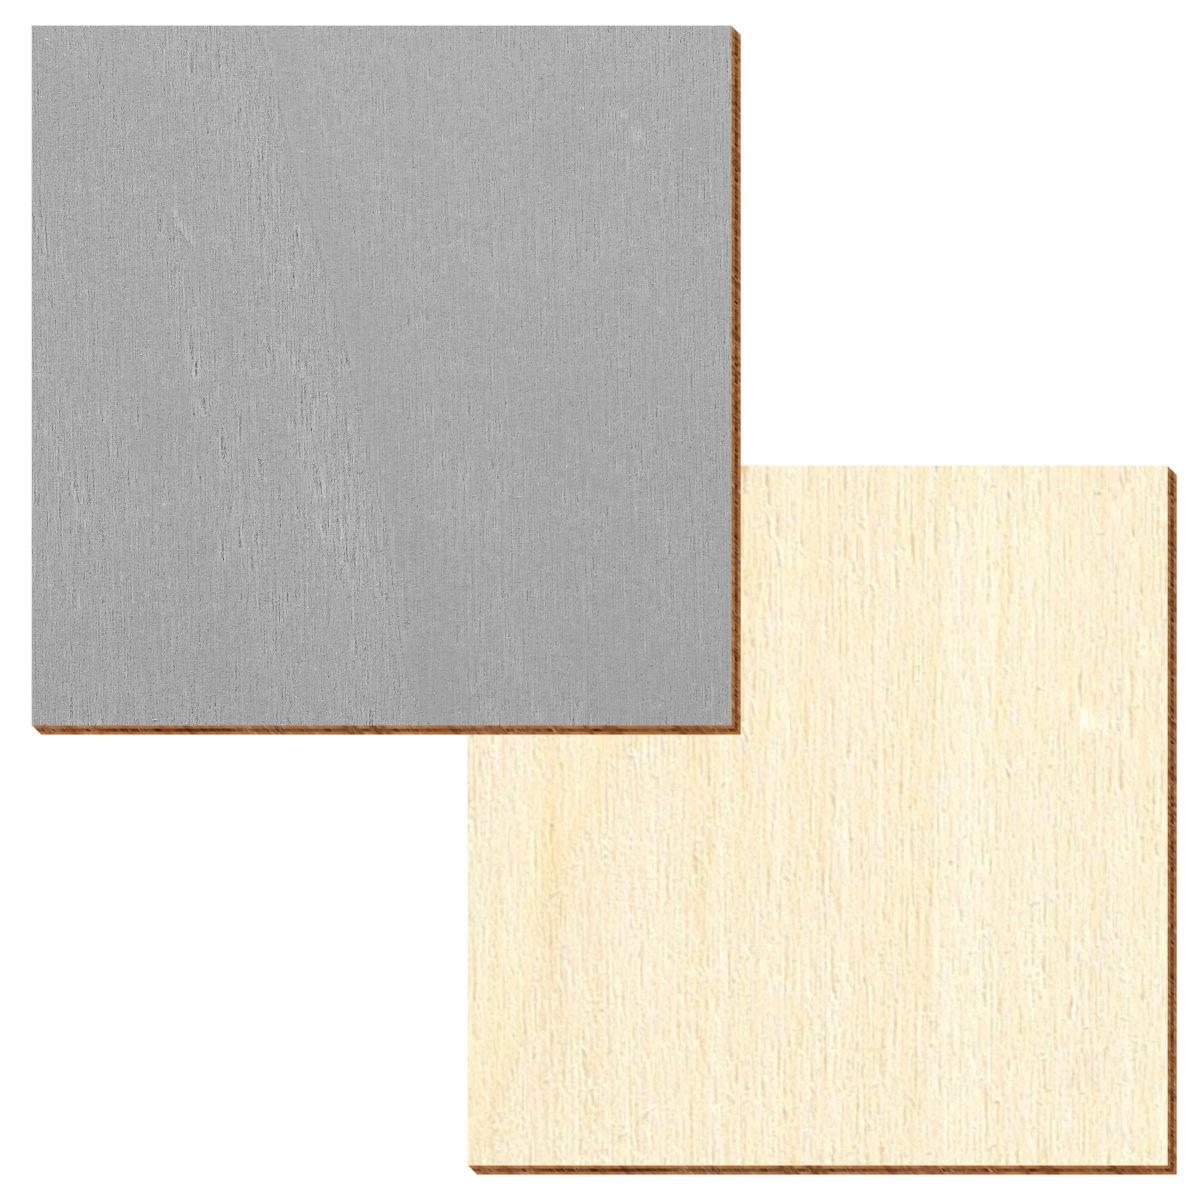 Holz Quadrate 1-50cm -Multiauswahl- Vierecke unbehandelt farbig selbstklebend